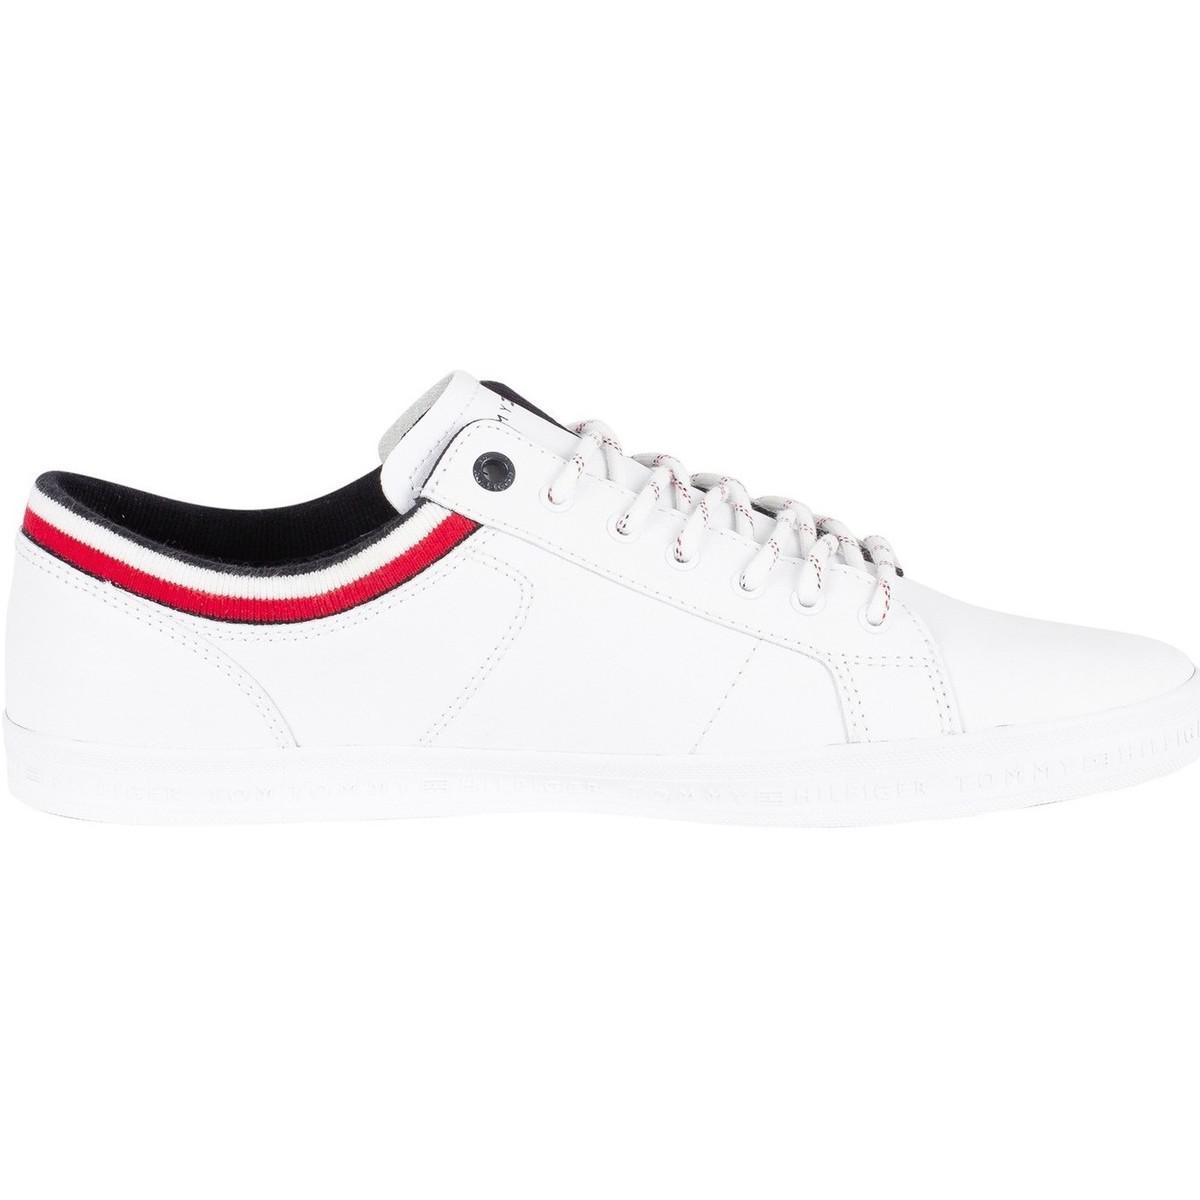 Homme Baskets basses essentielles, Blanc hommes Chaussures